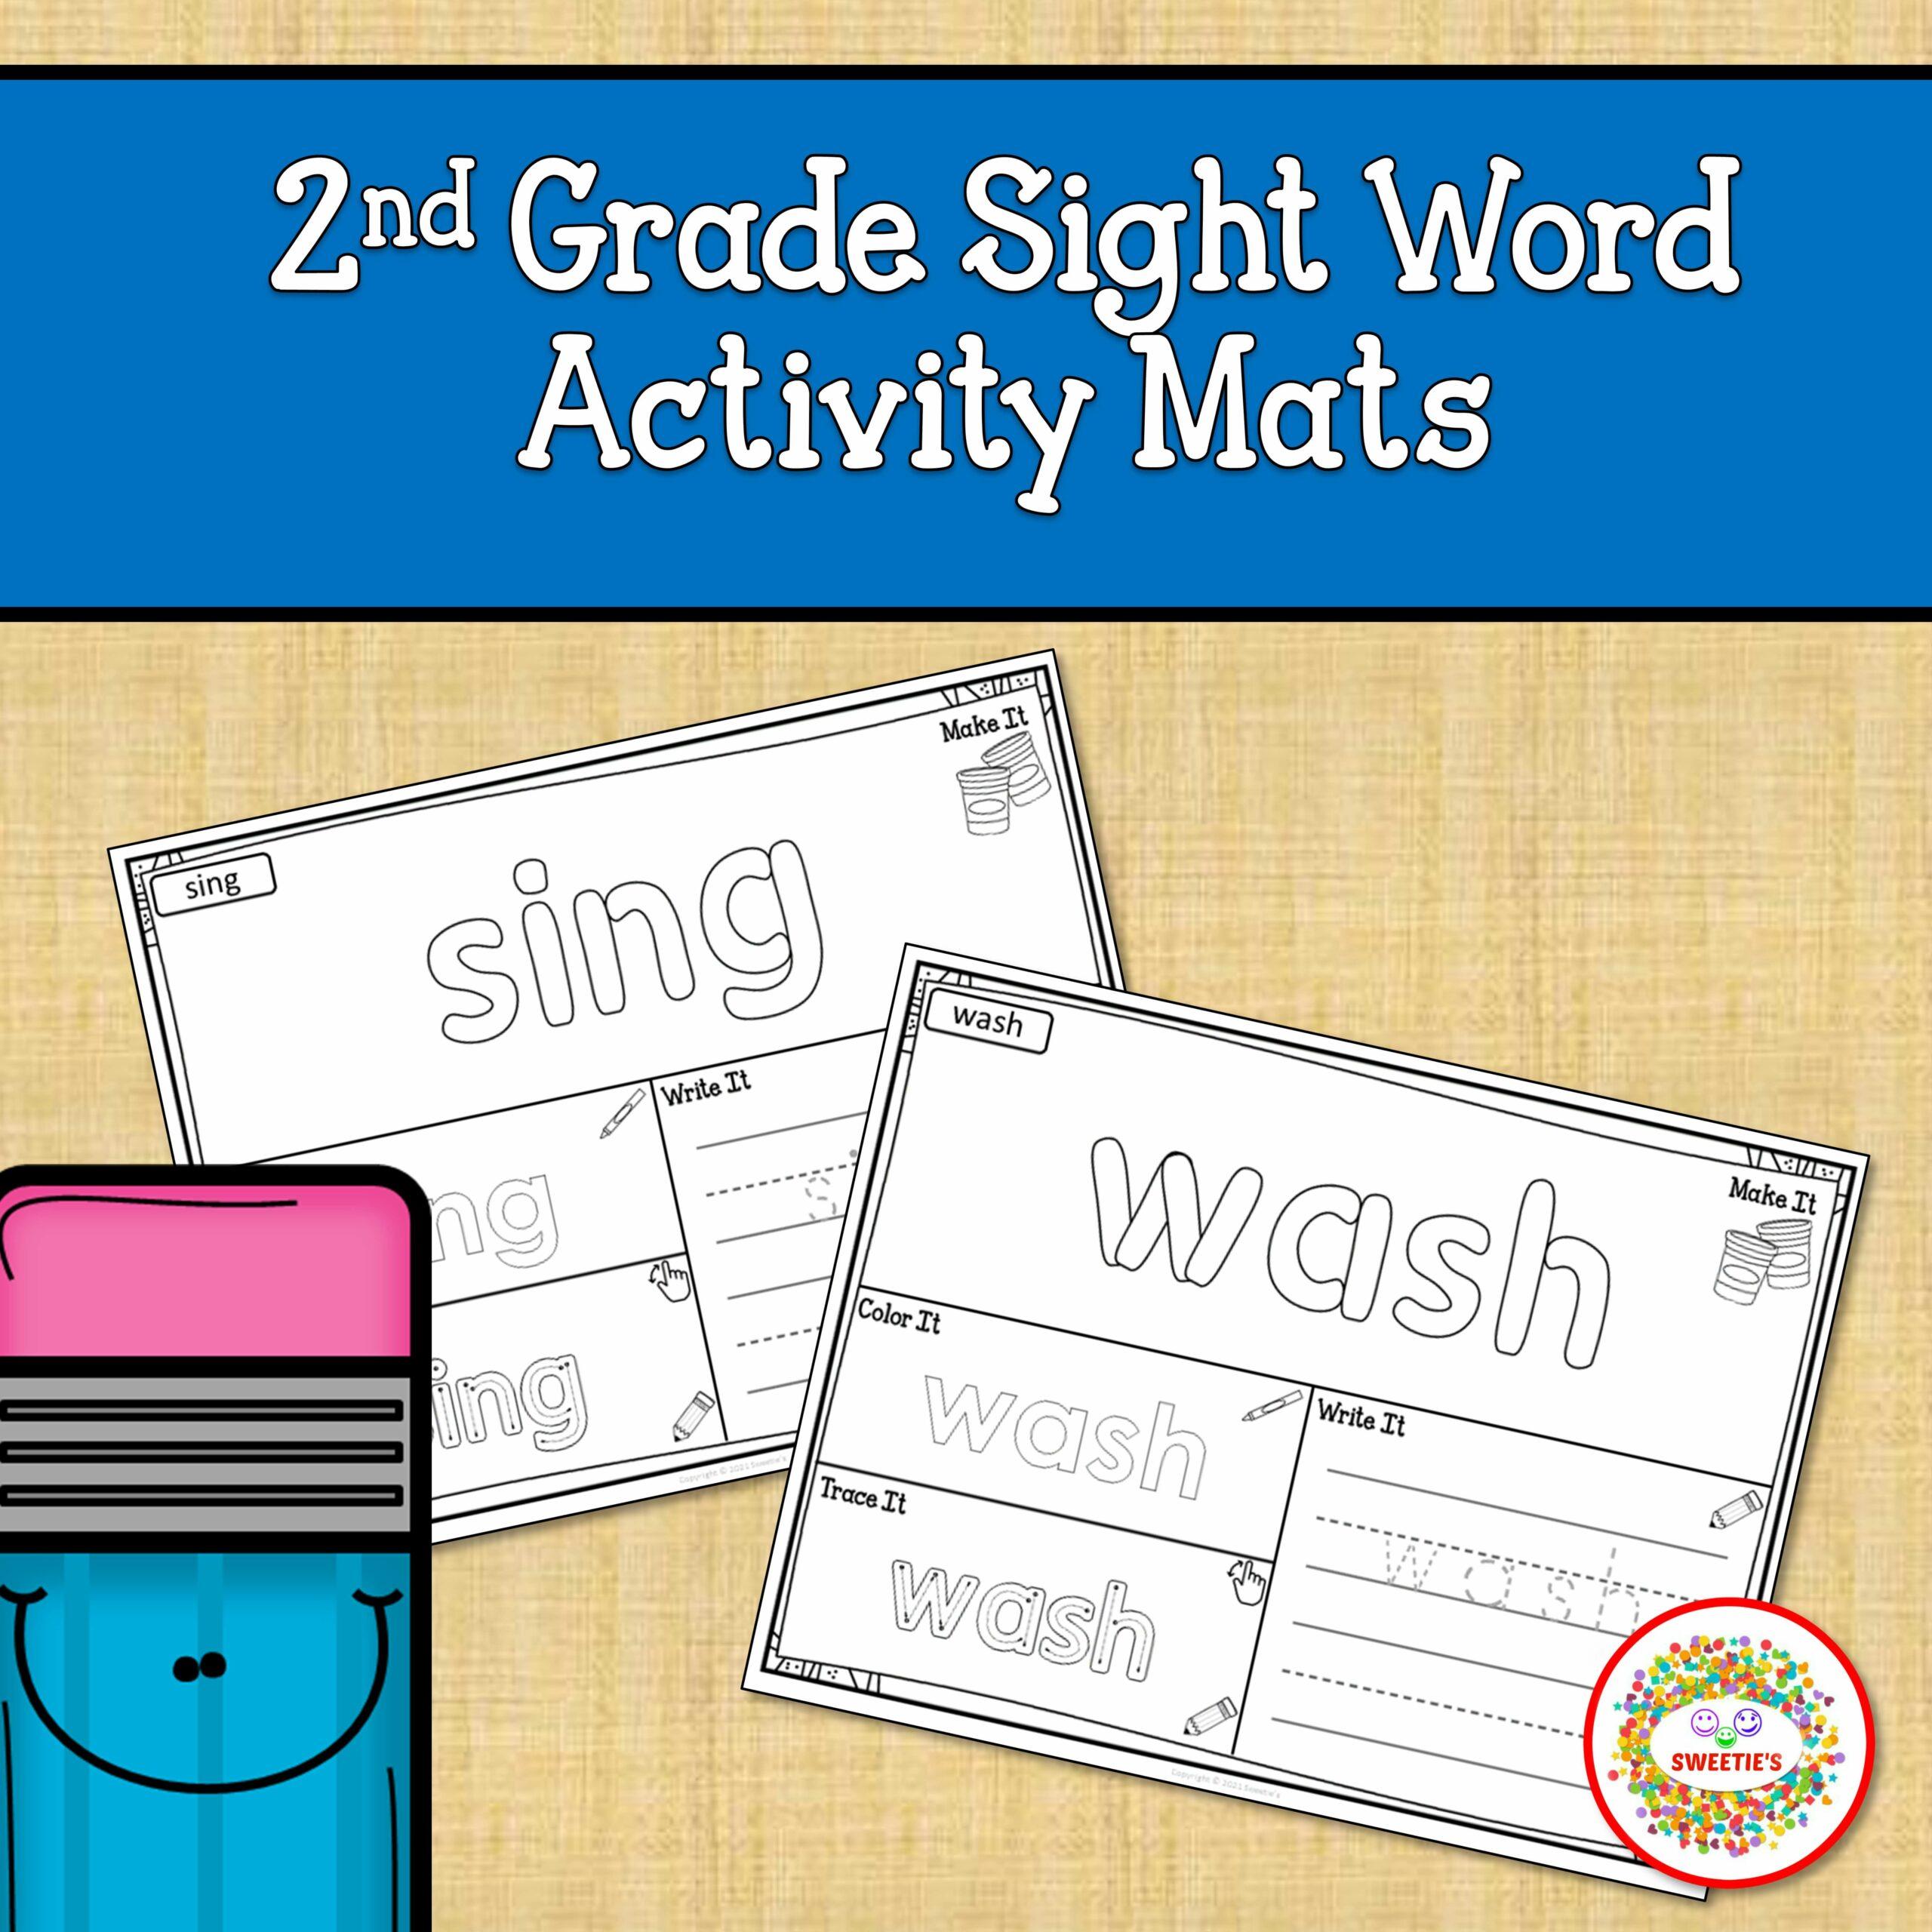 Second Grade Sight Word Mats Printable